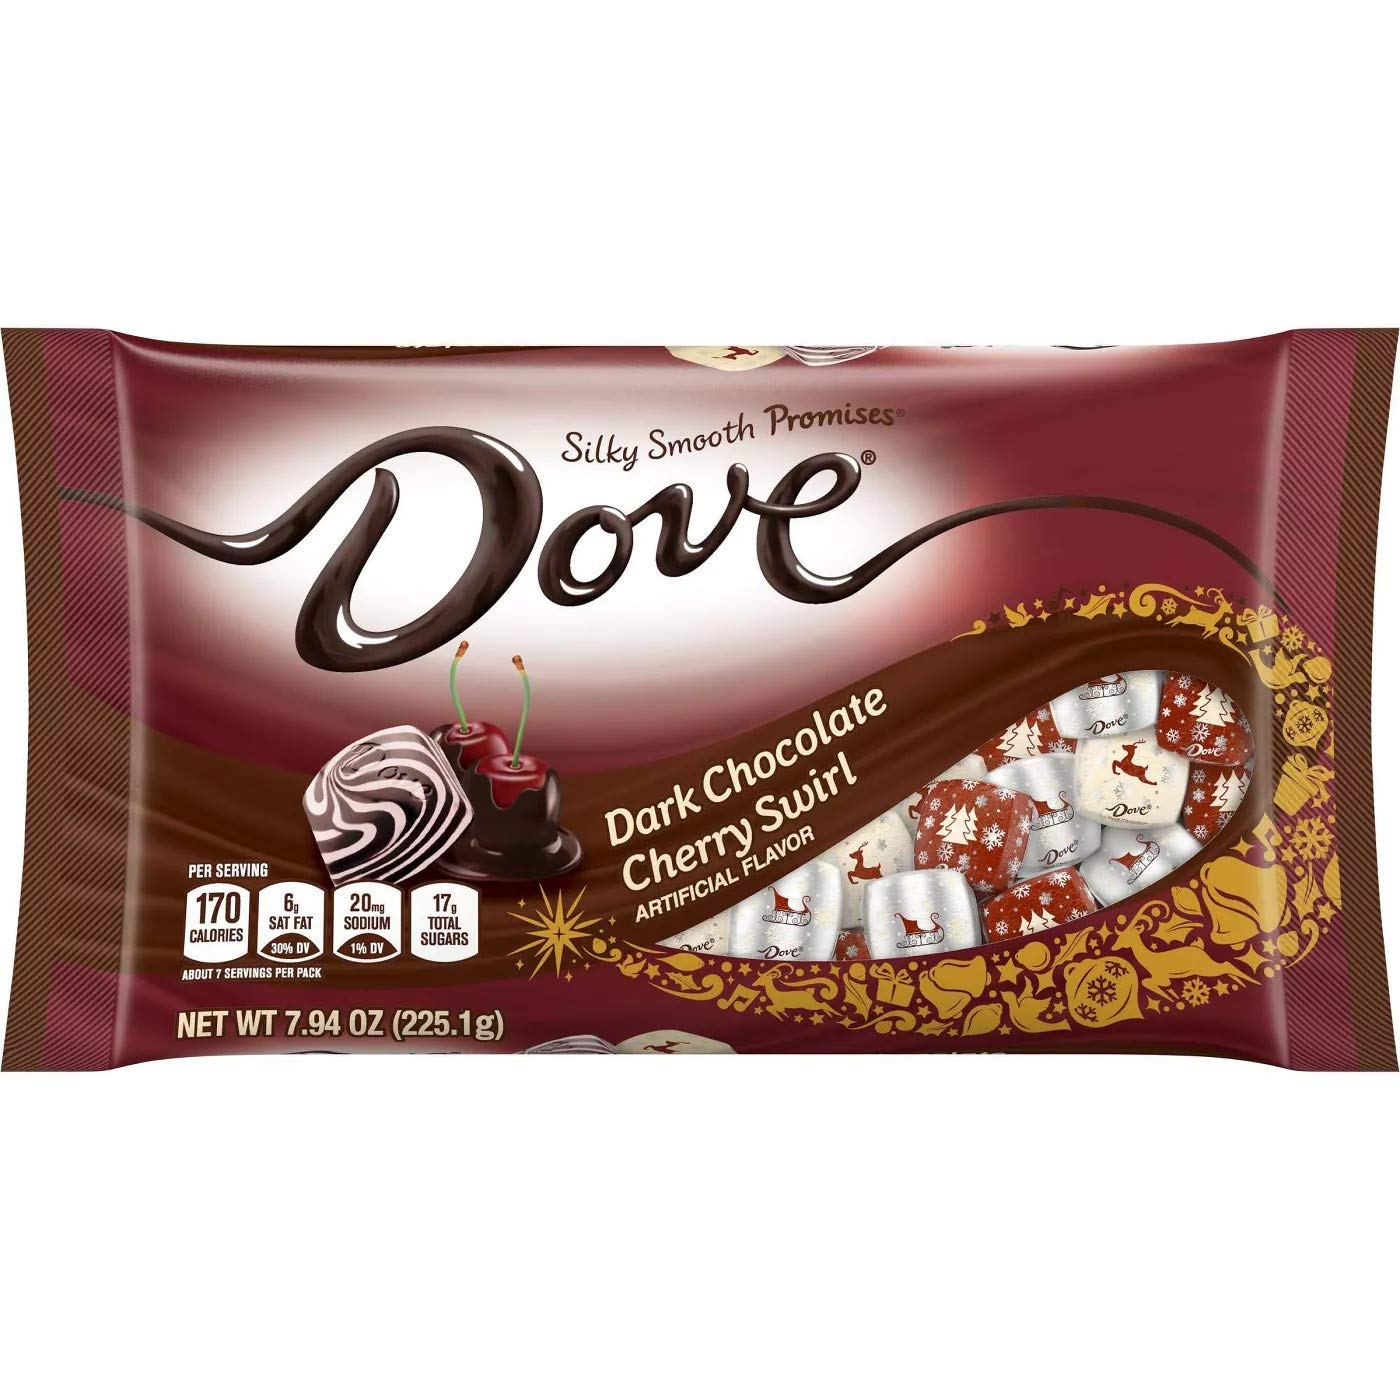 Dove Dark Chocolate Cherry - 7.94oz